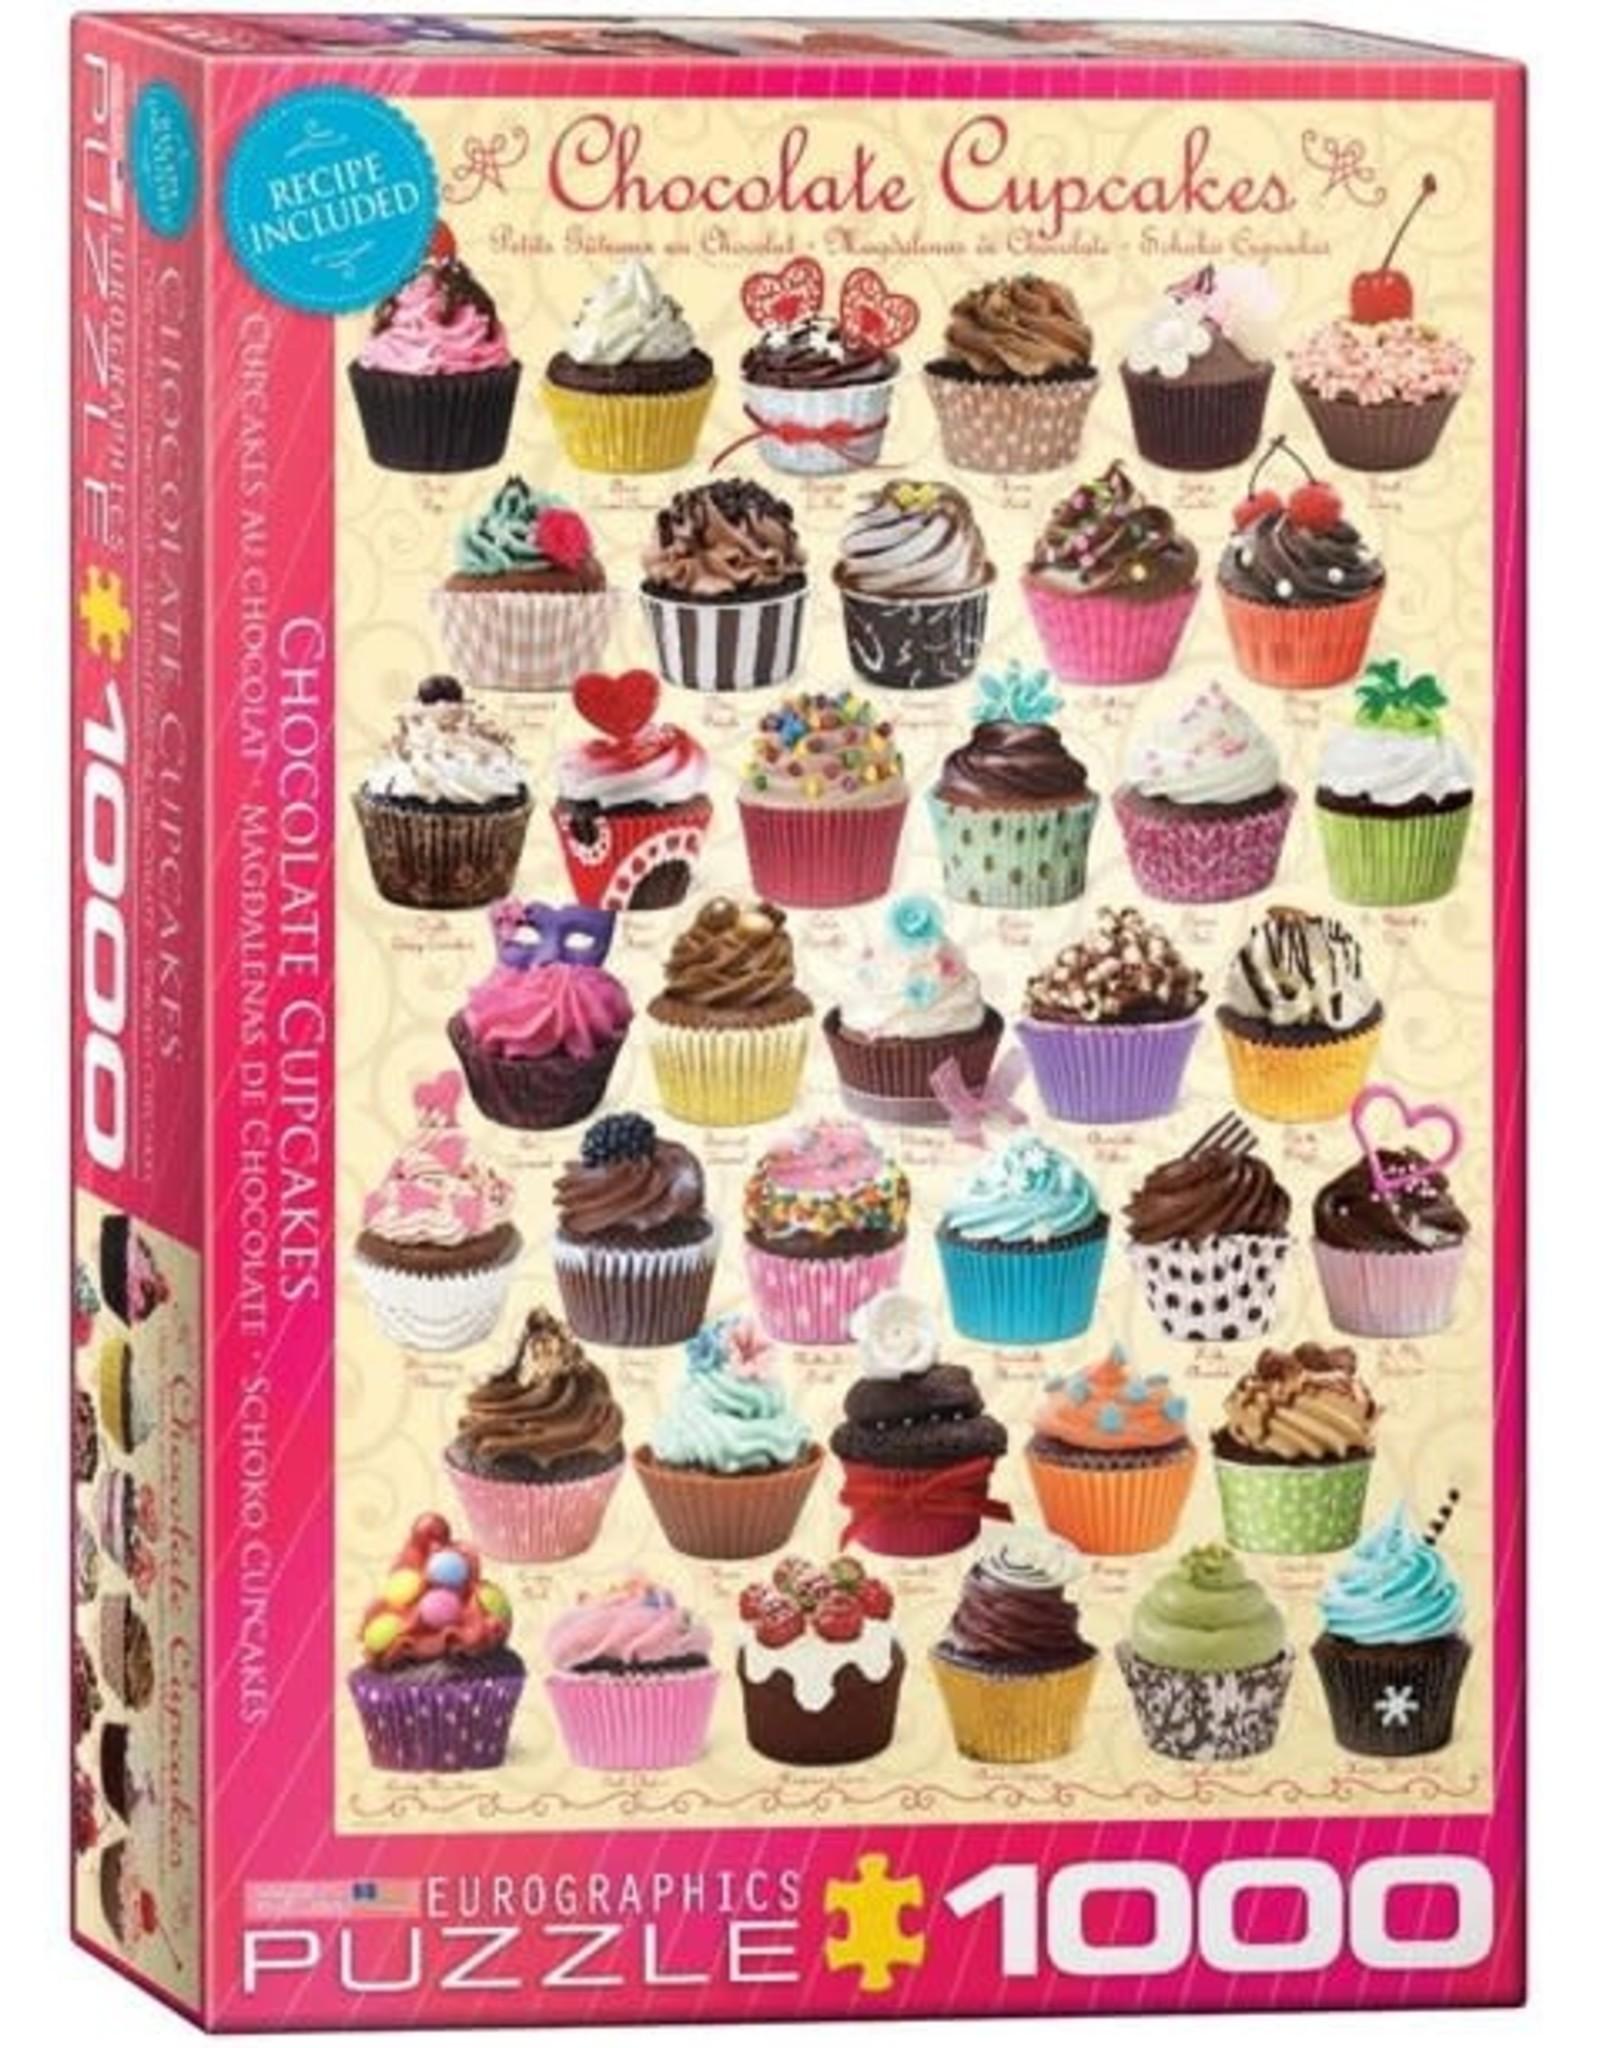 Eurographics Chocolate Cupcakes 1000pc